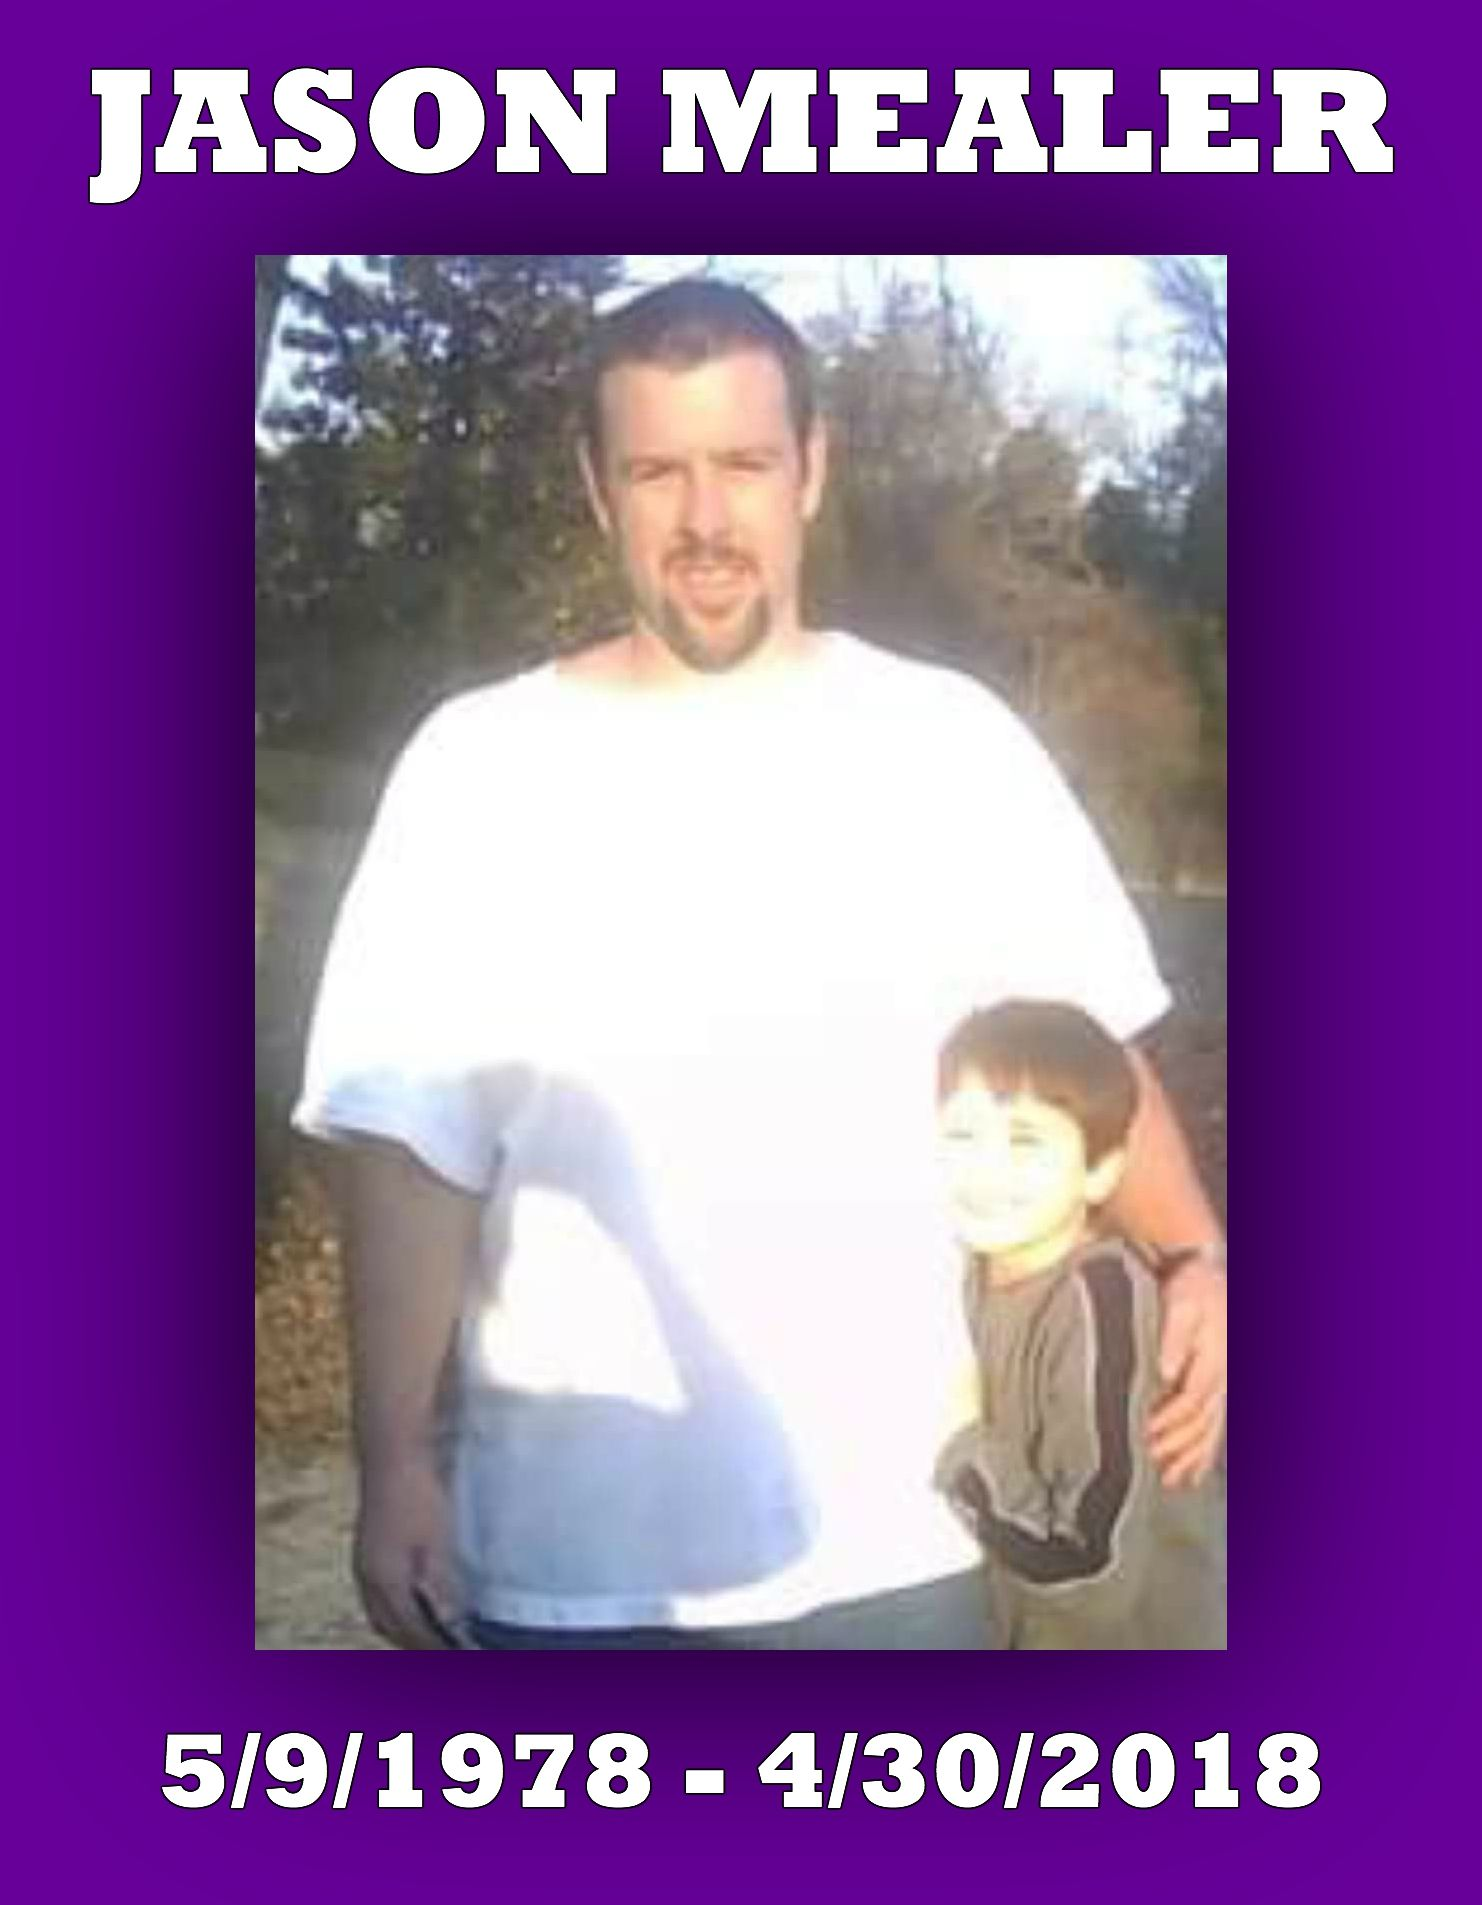 Jason Mealer JasonMealer Overdose awareness, Face, Jason